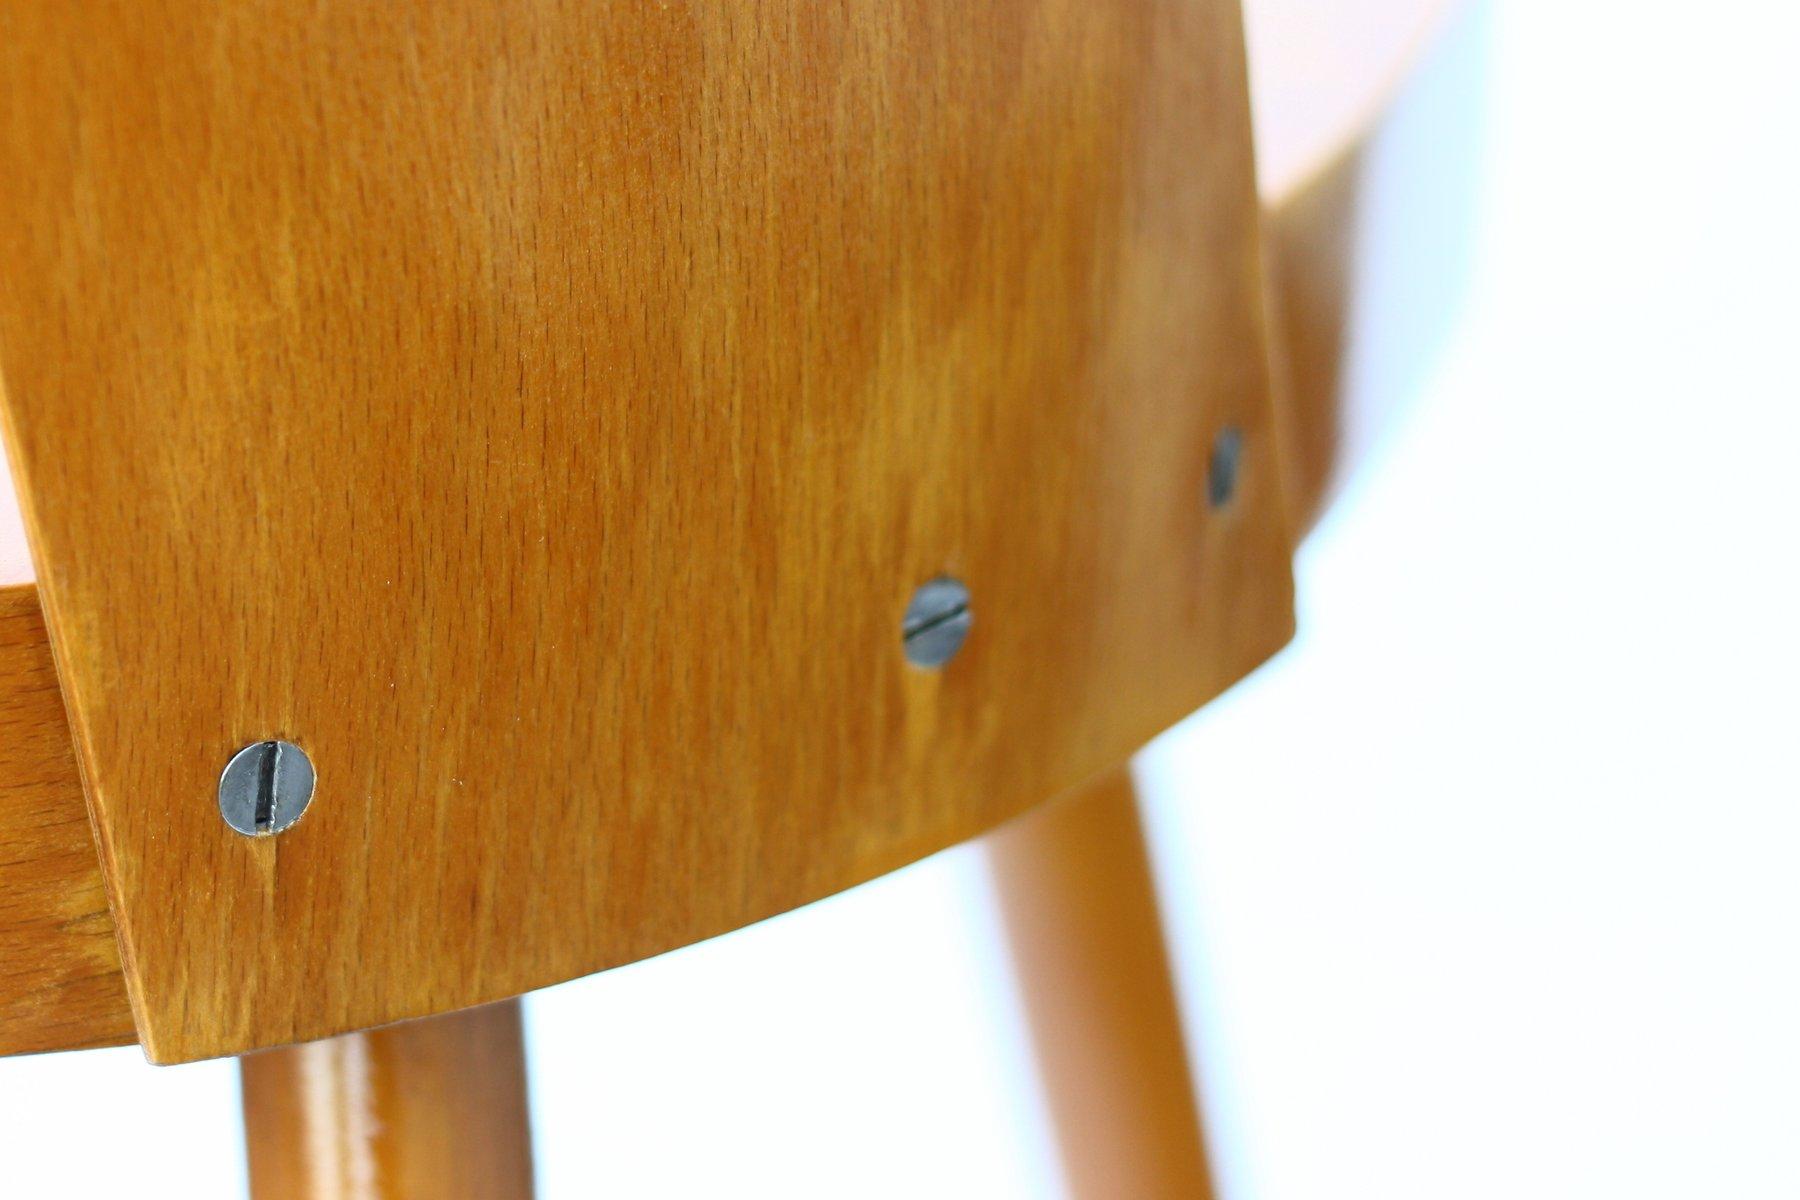 vintage holzstuhl von oswald haerdtl f r ton bei pamono kaufen. Black Bedroom Furniture Sets. Home Design Ideas